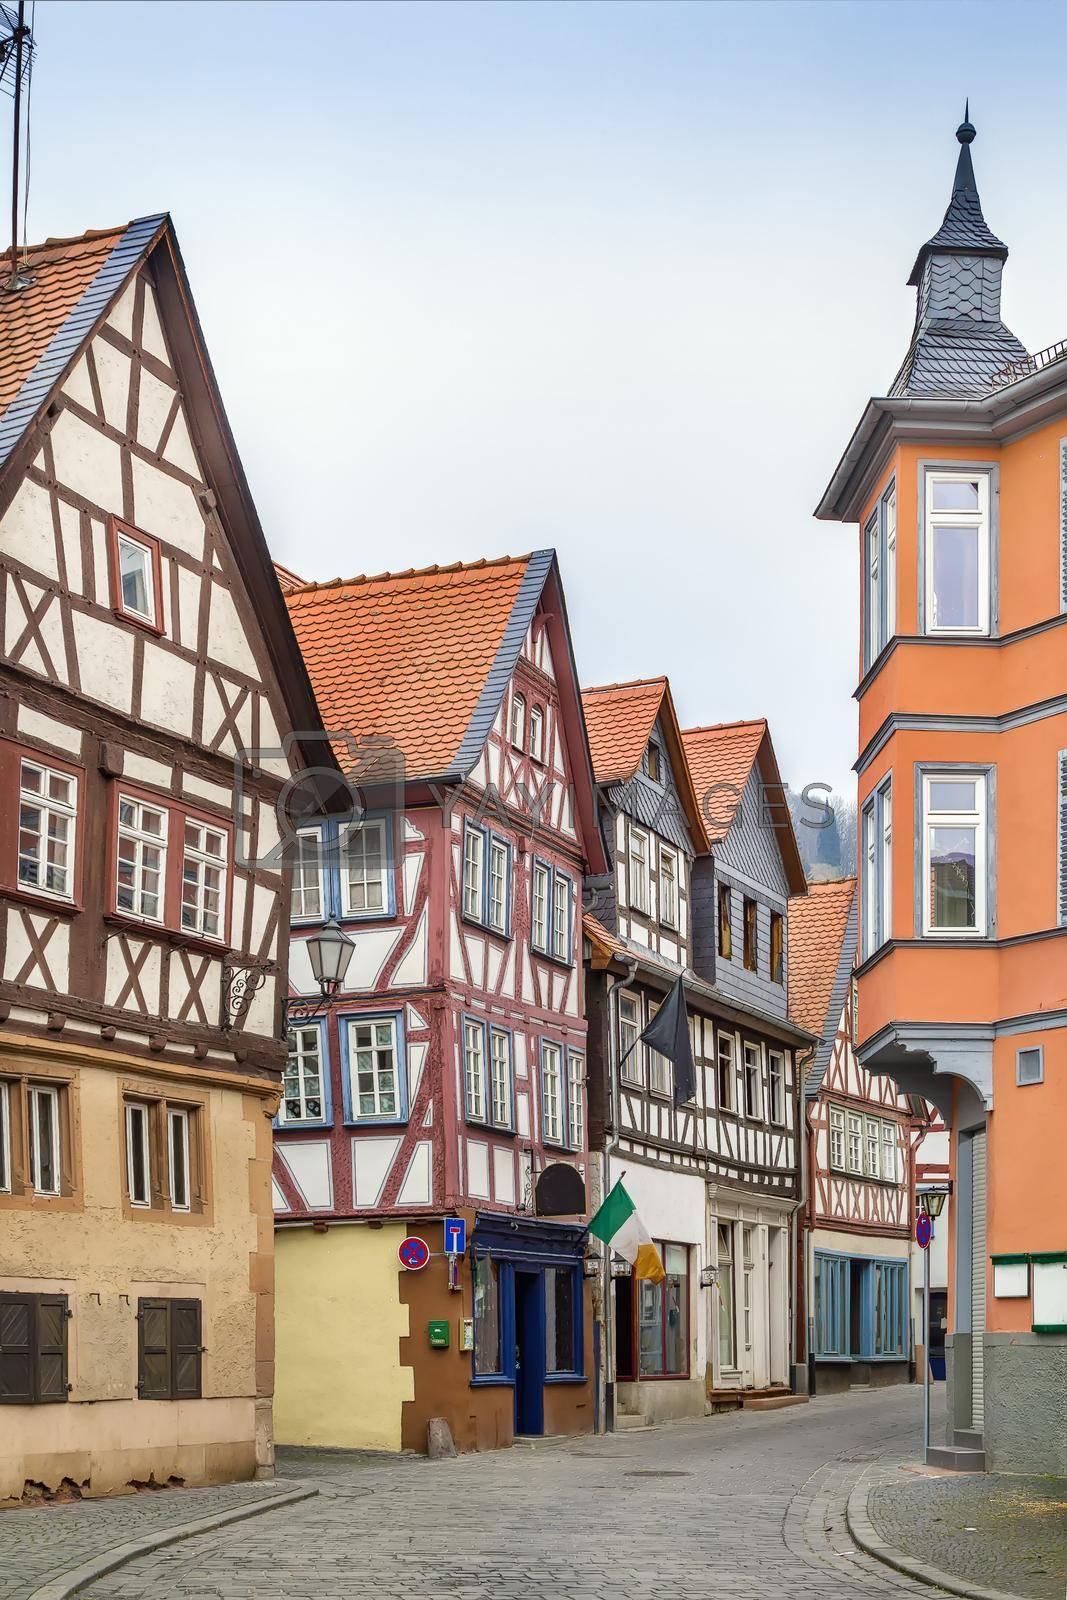 Royalty free image of Street in Budingen, Germany by borisb17